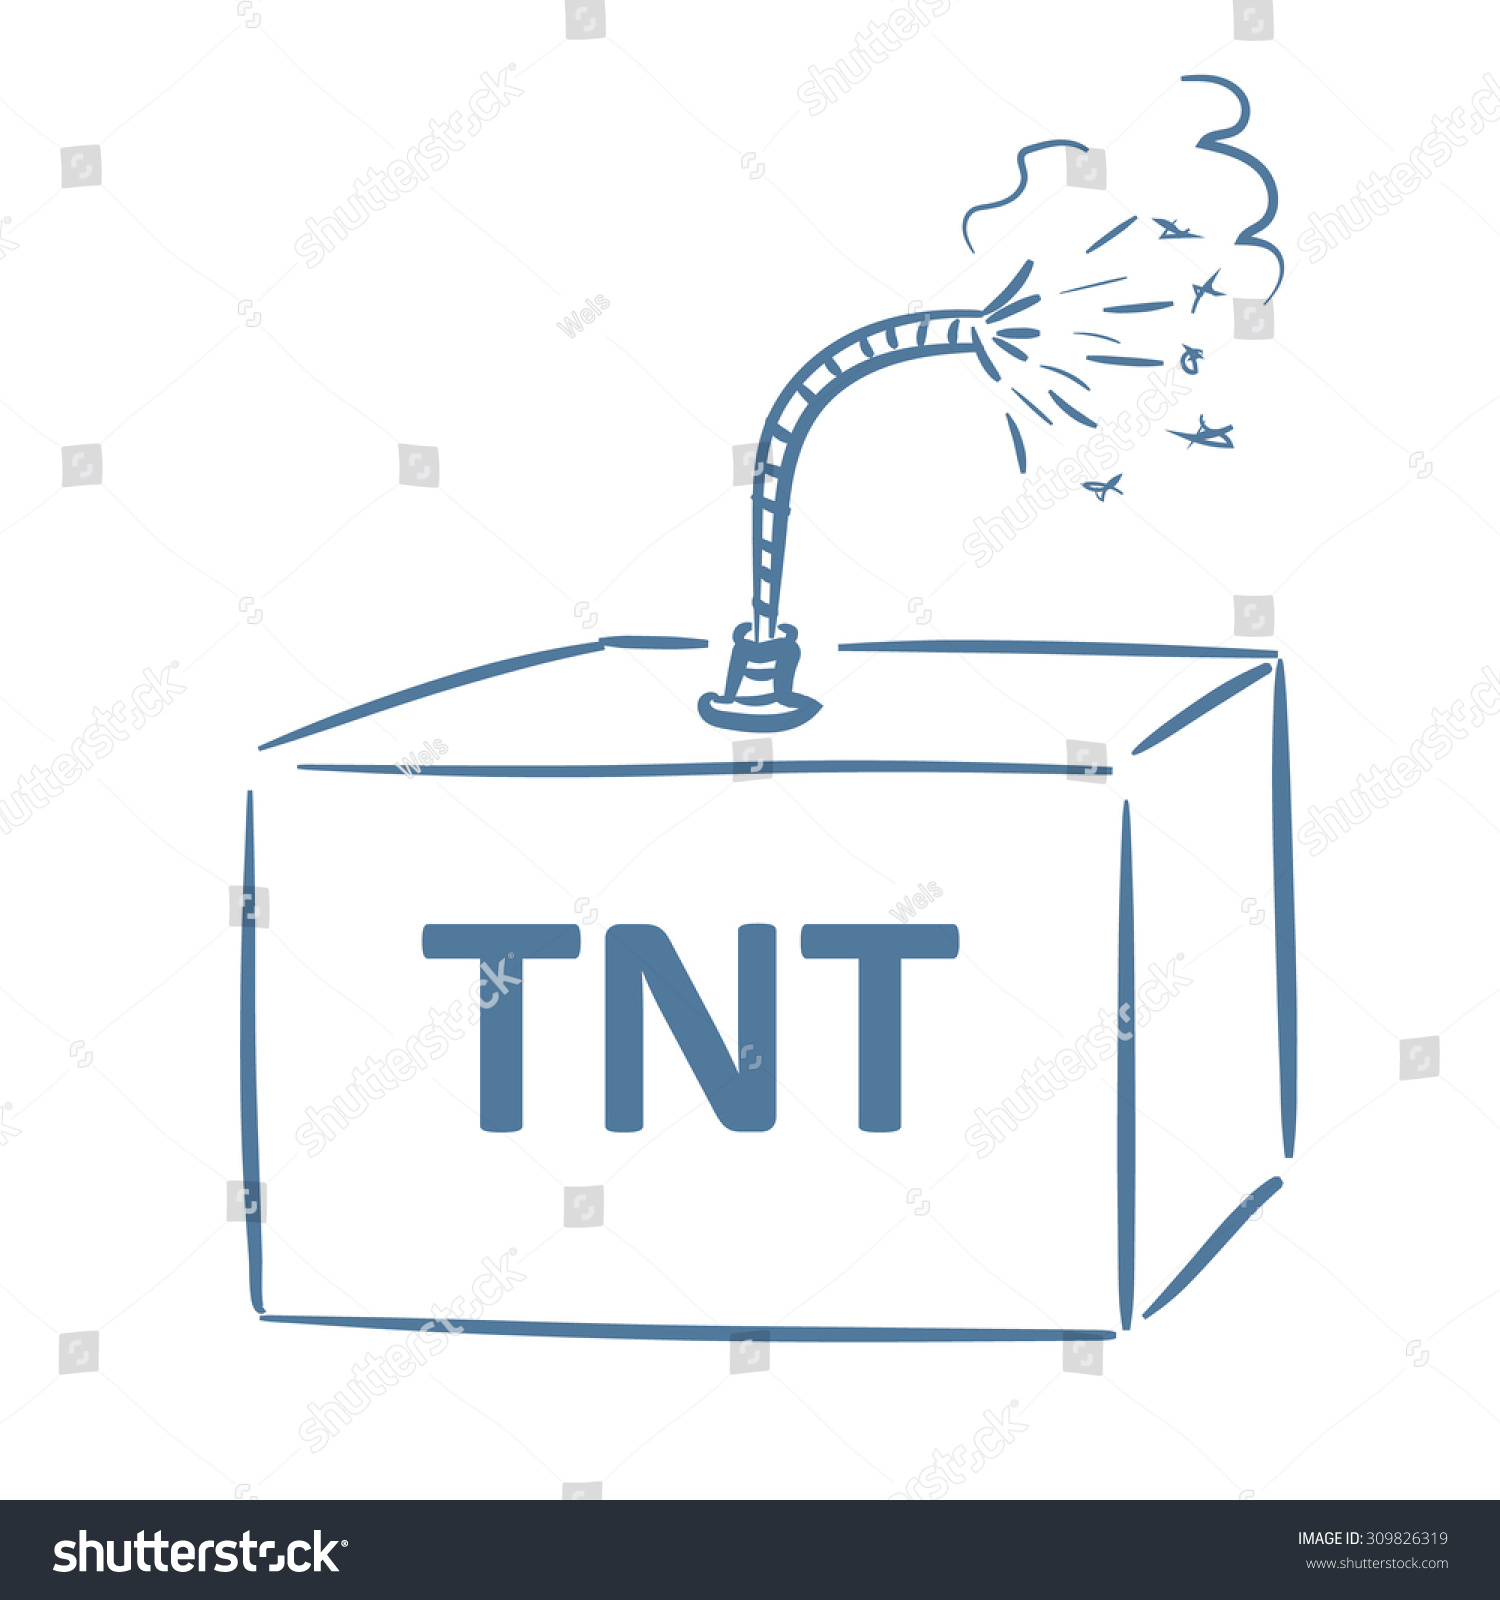 Tnt Box Burning Fuse Stock Vector Royalty Free 309826319 Cartoon With